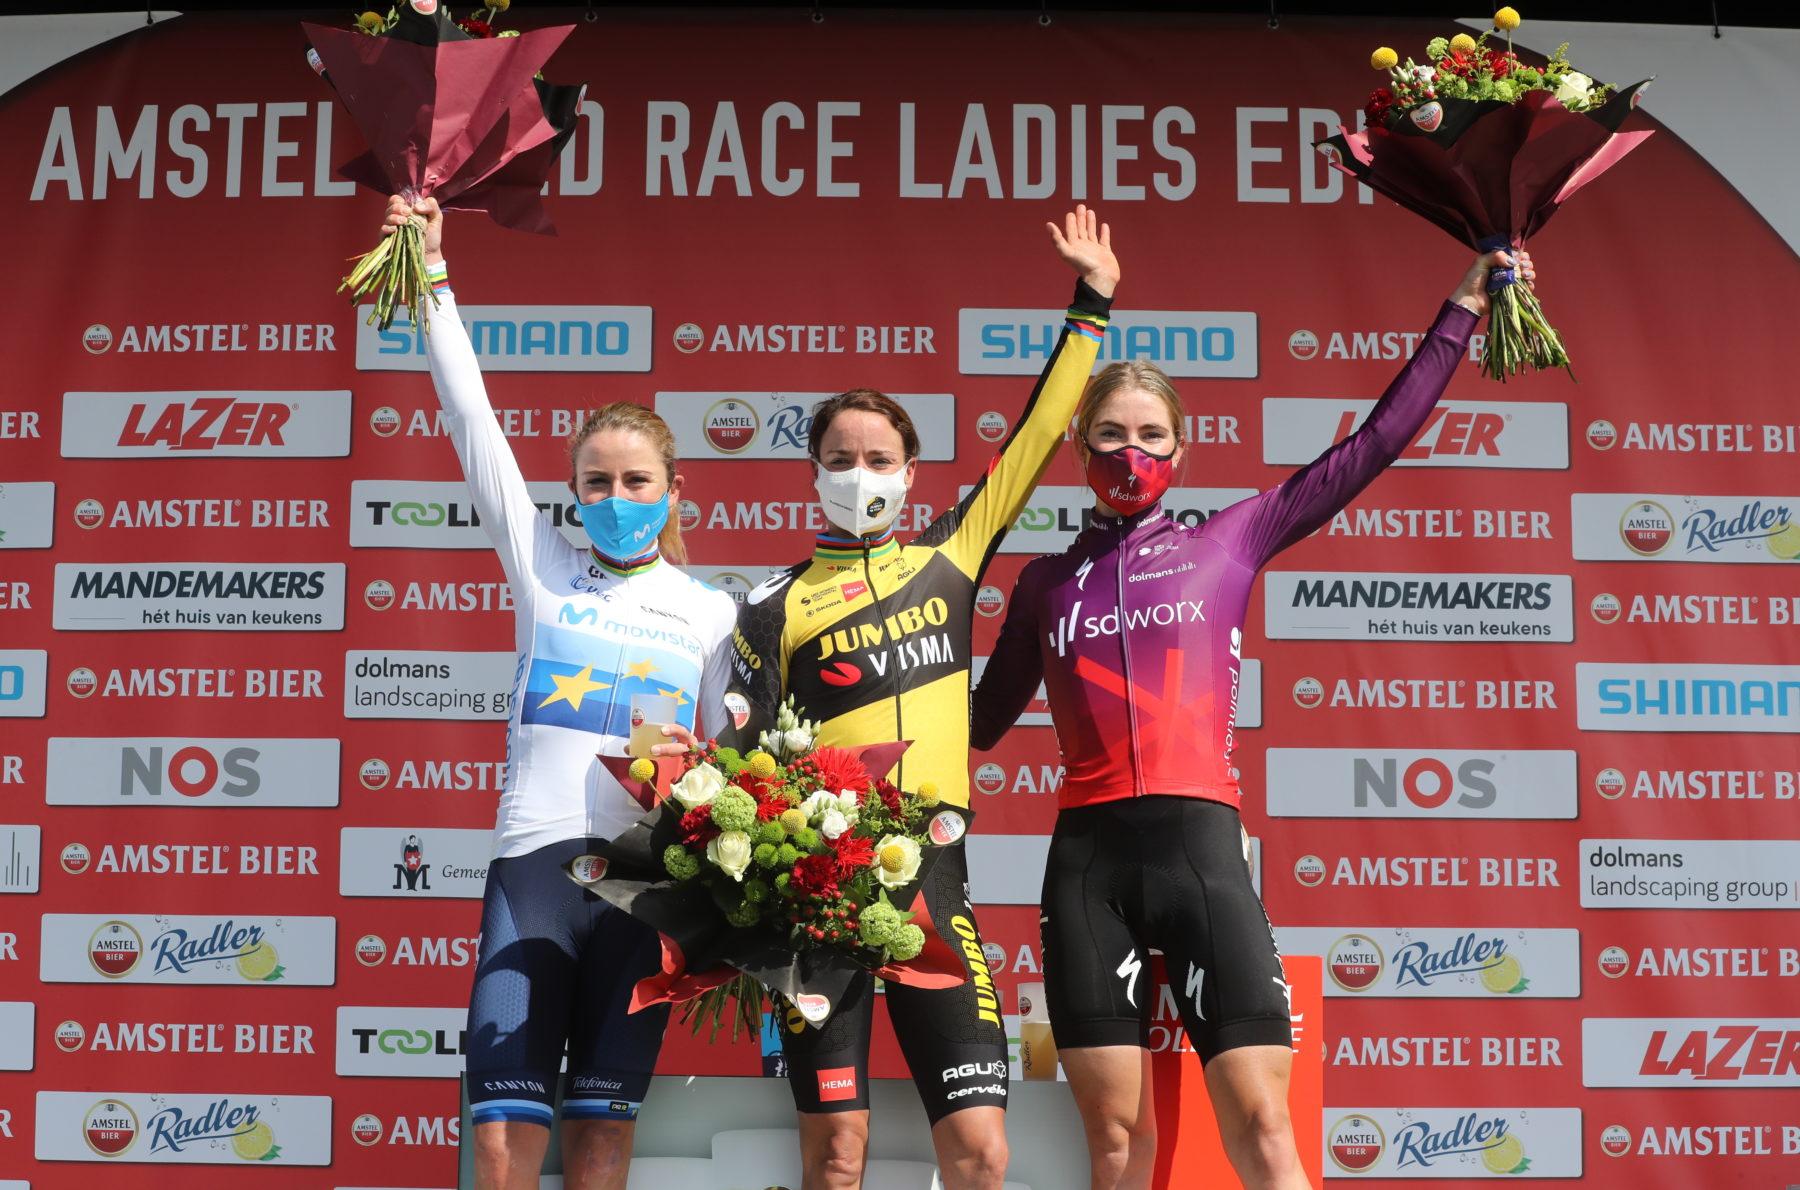 News' image'Van Vleuten vuelve a ser protagonista en la Amstel Gold Race (3ª)'